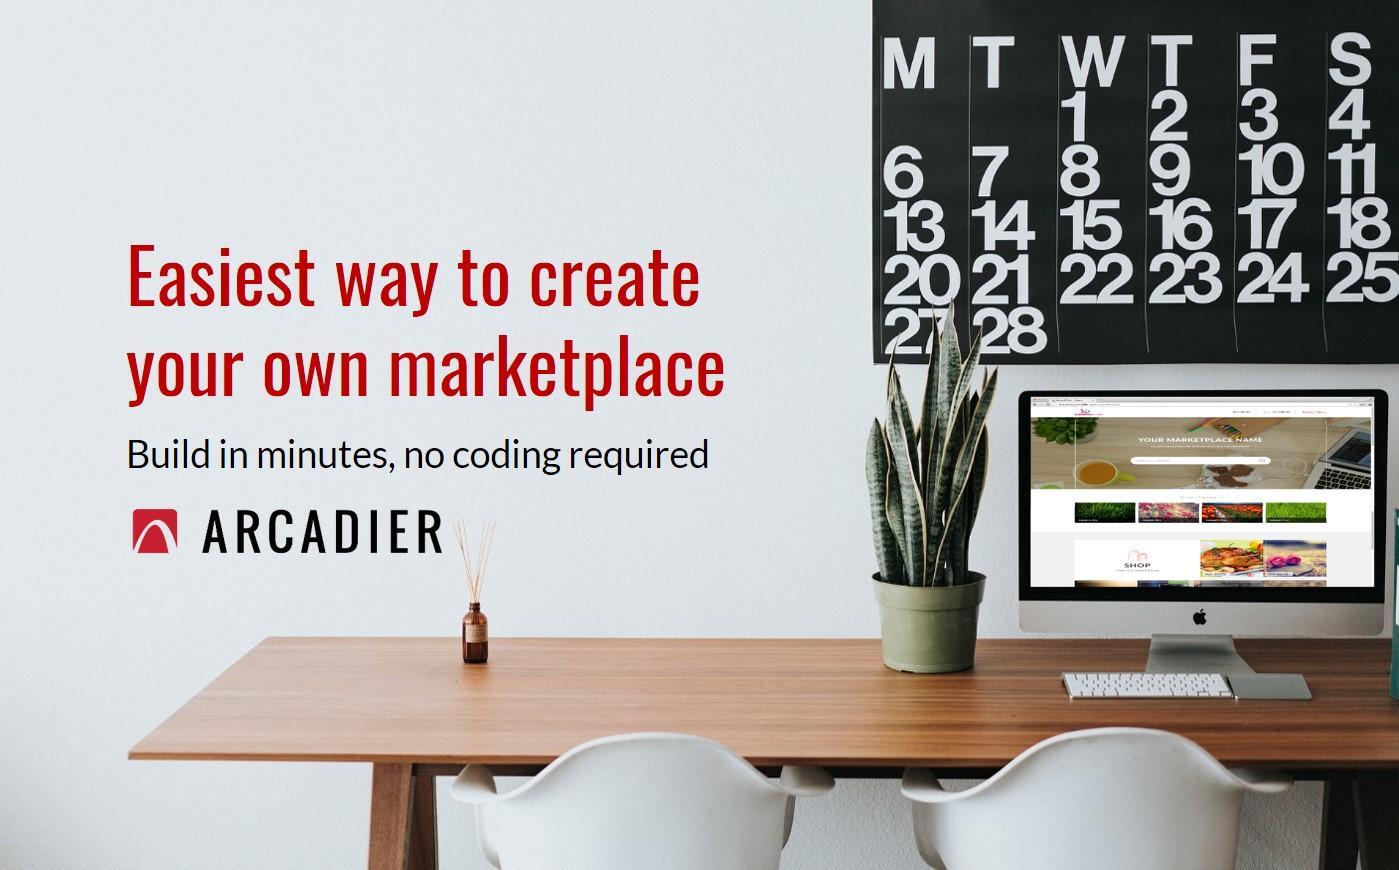 Review Arcadier: Leading Online Marketplace Builder - appvizer